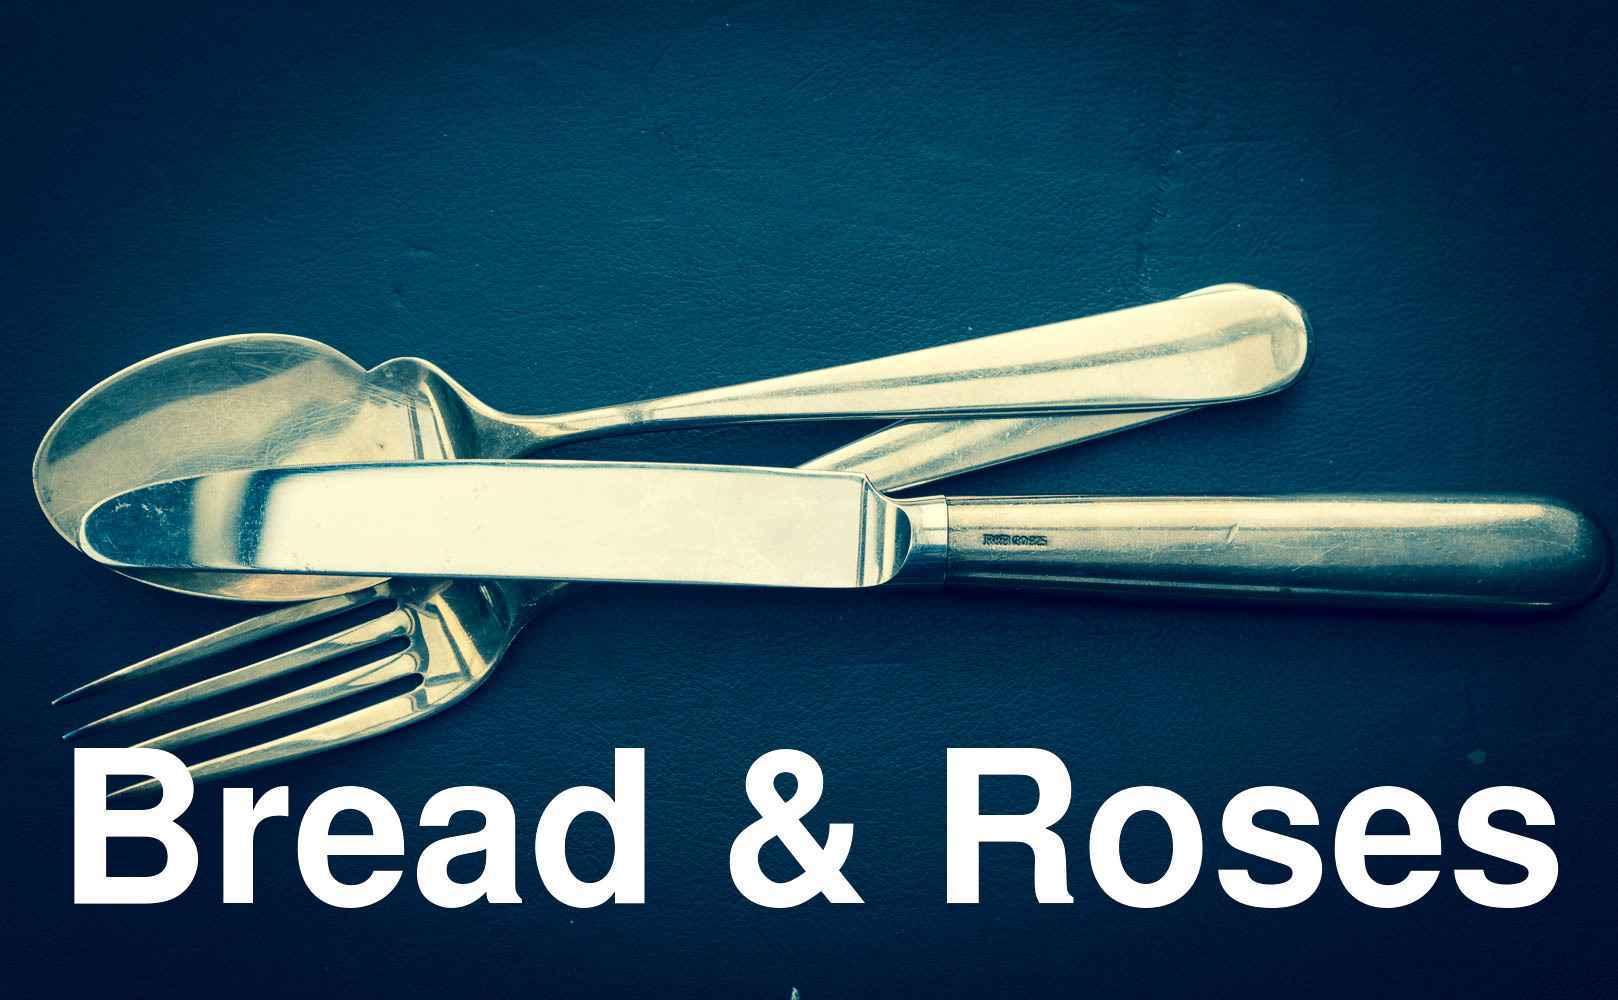 Restaurantkritik: Bread & Roses in Düsseldorf,